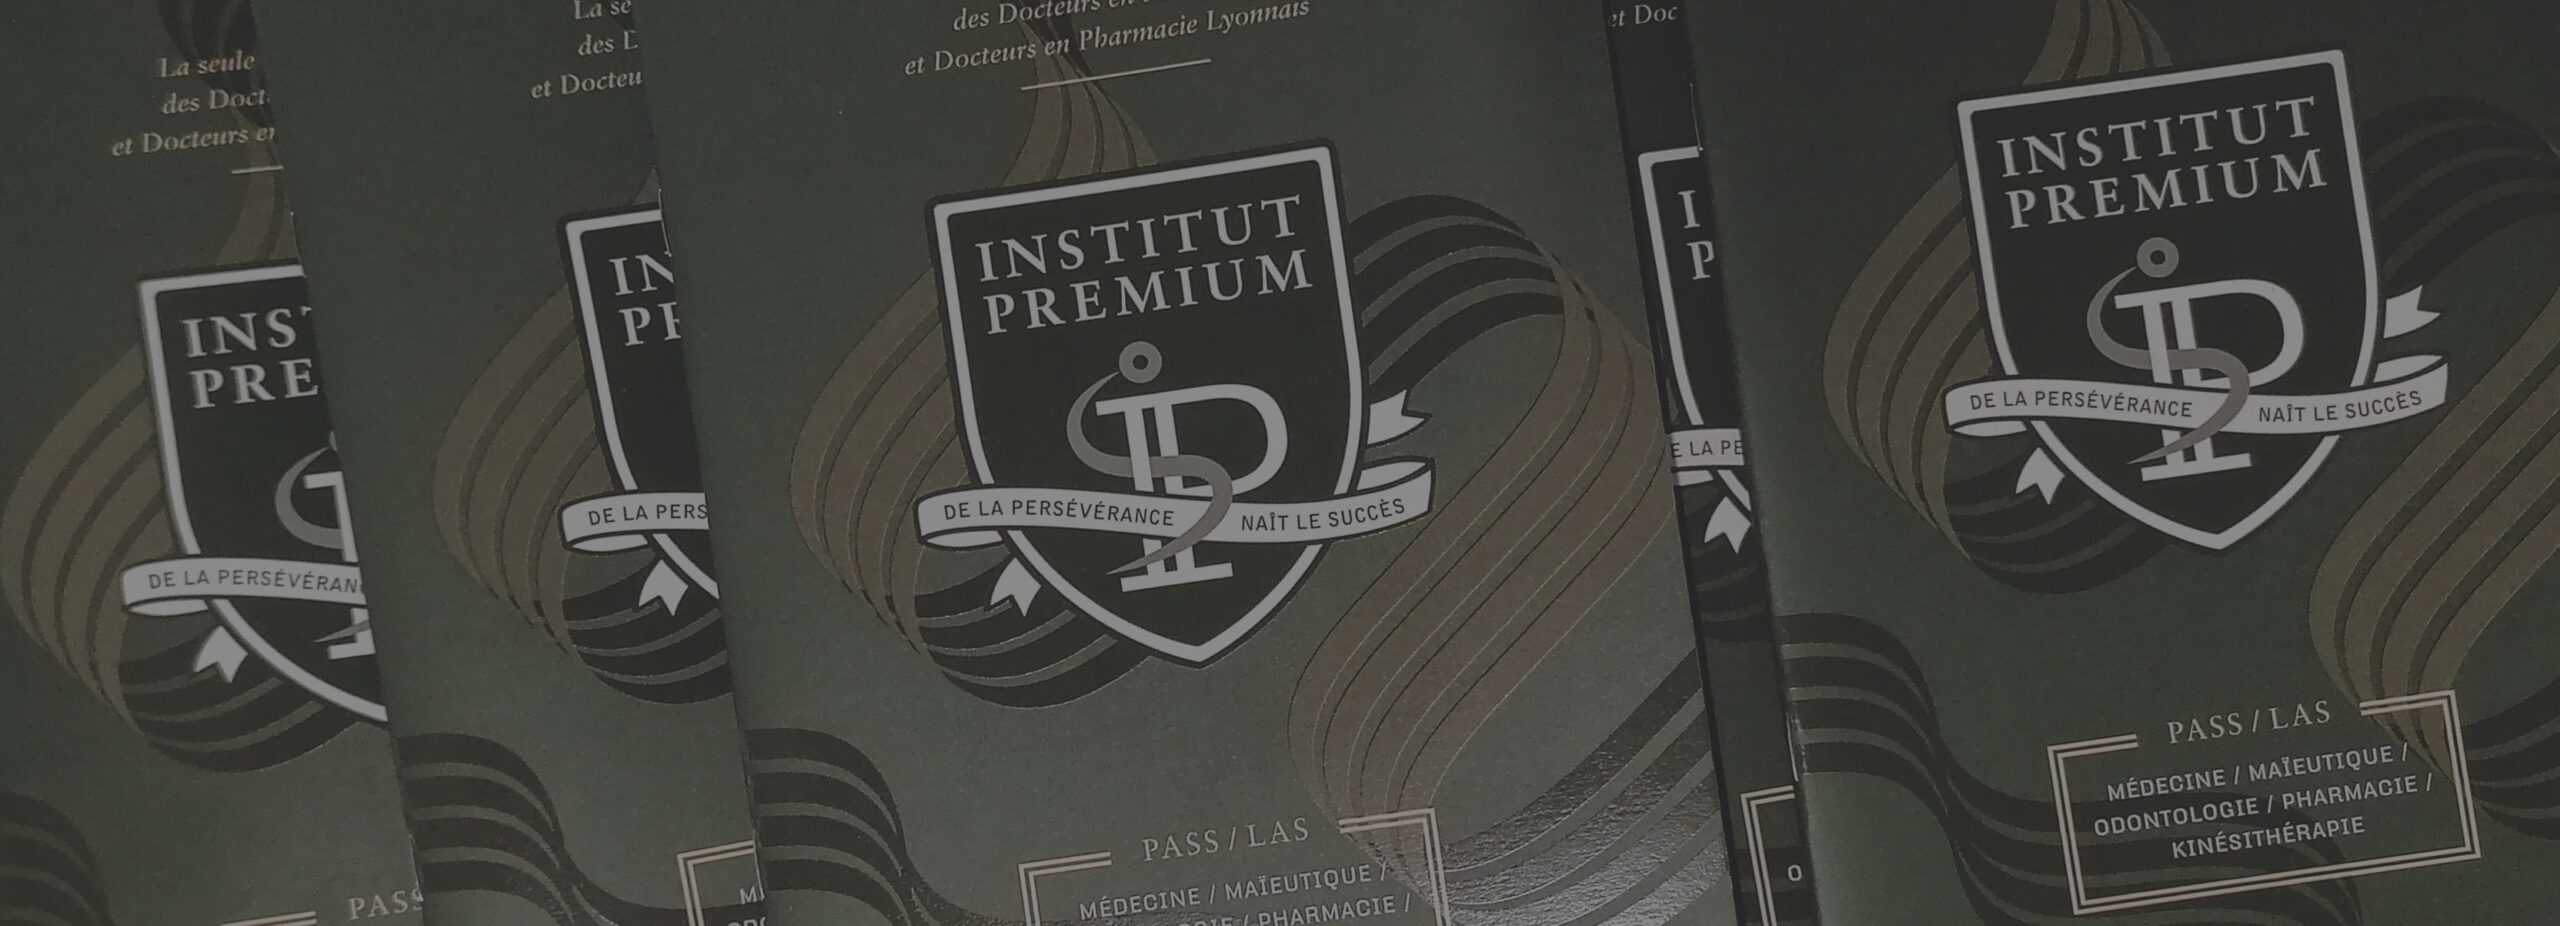 Documentation 2021/2022 disponible